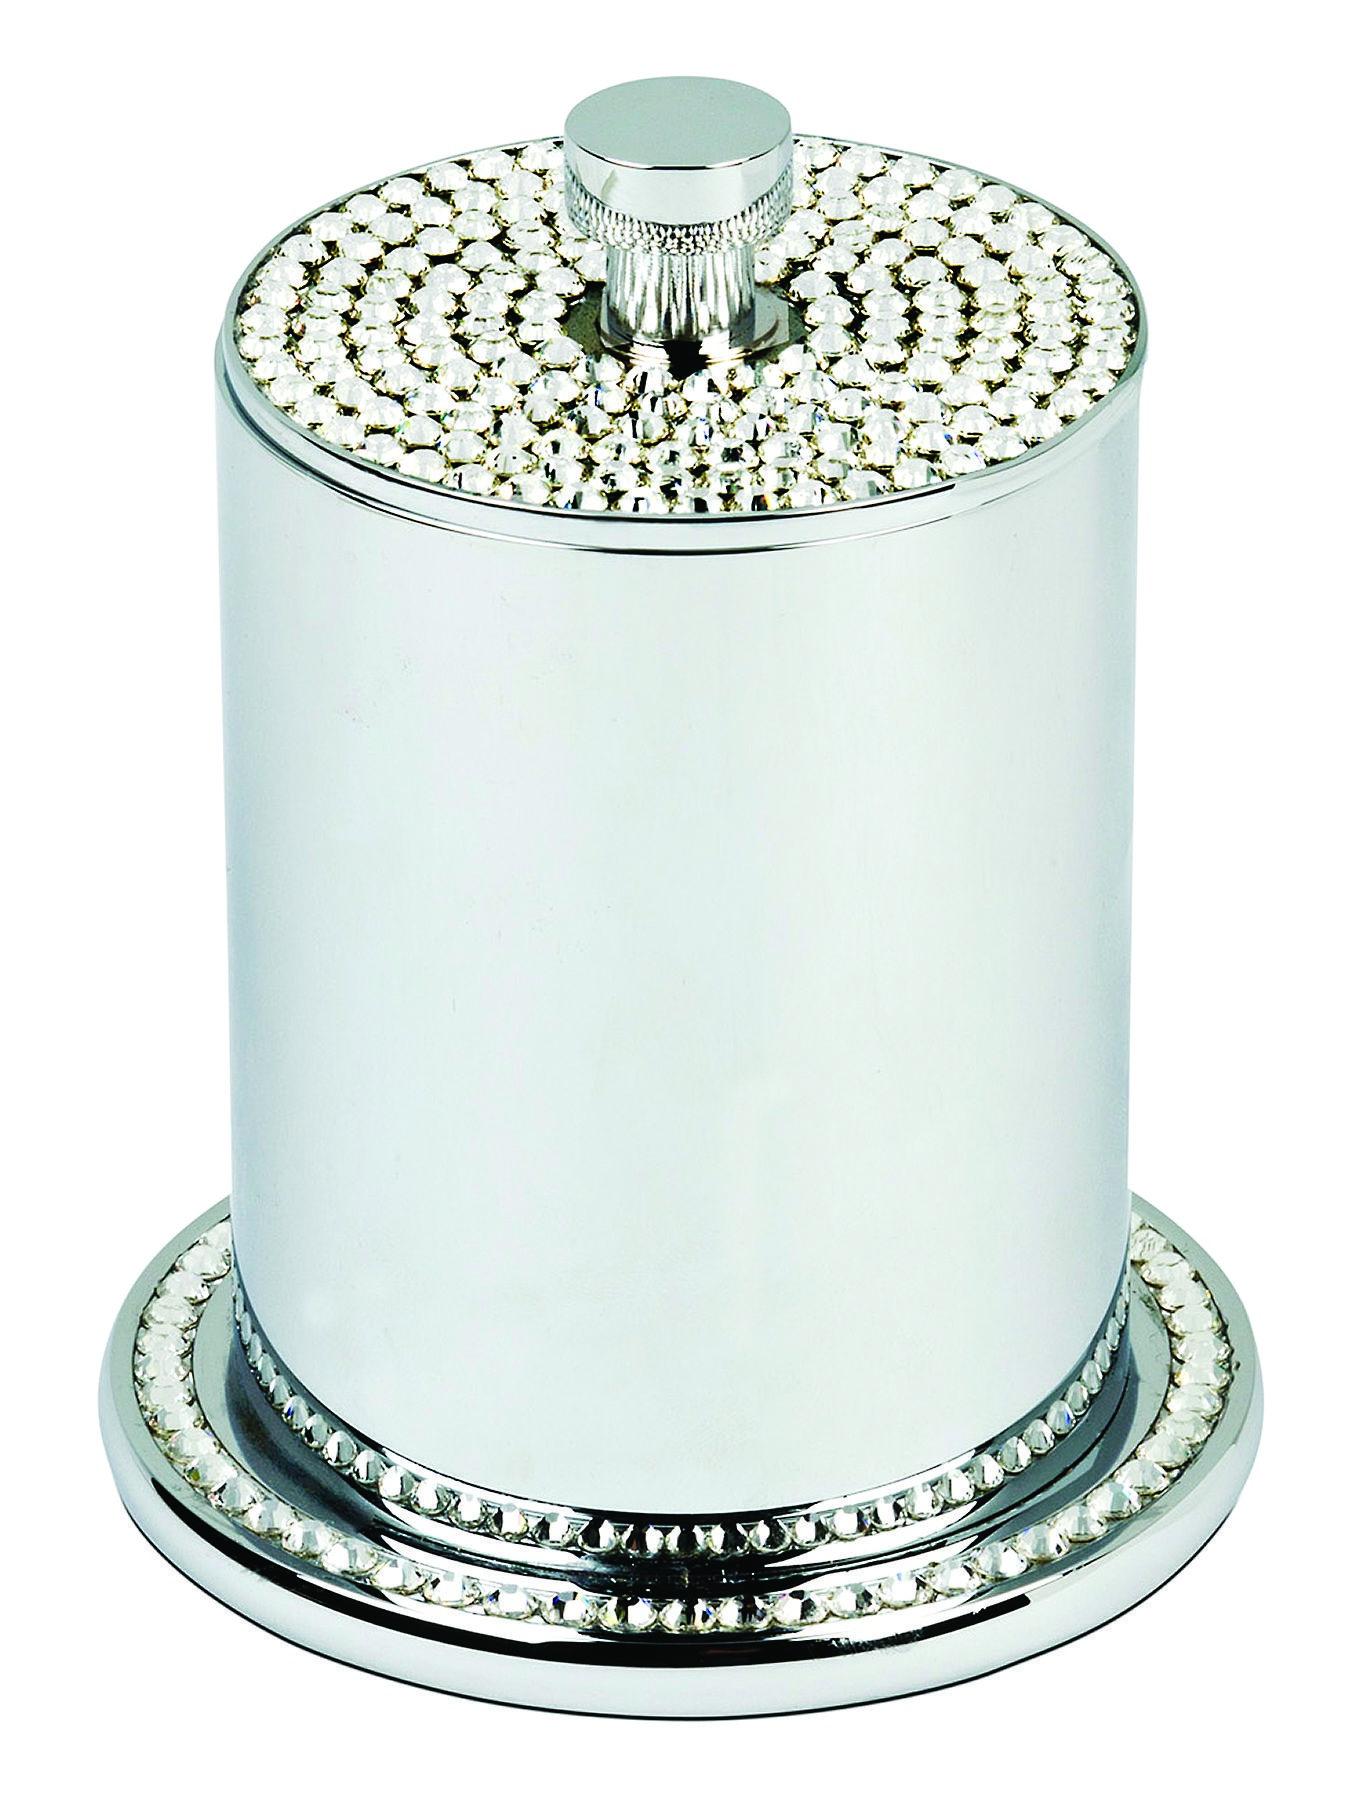 Crystal Bathroom Accessories In Bling Bathroom Accessories Topex Crystal Bath A203080921